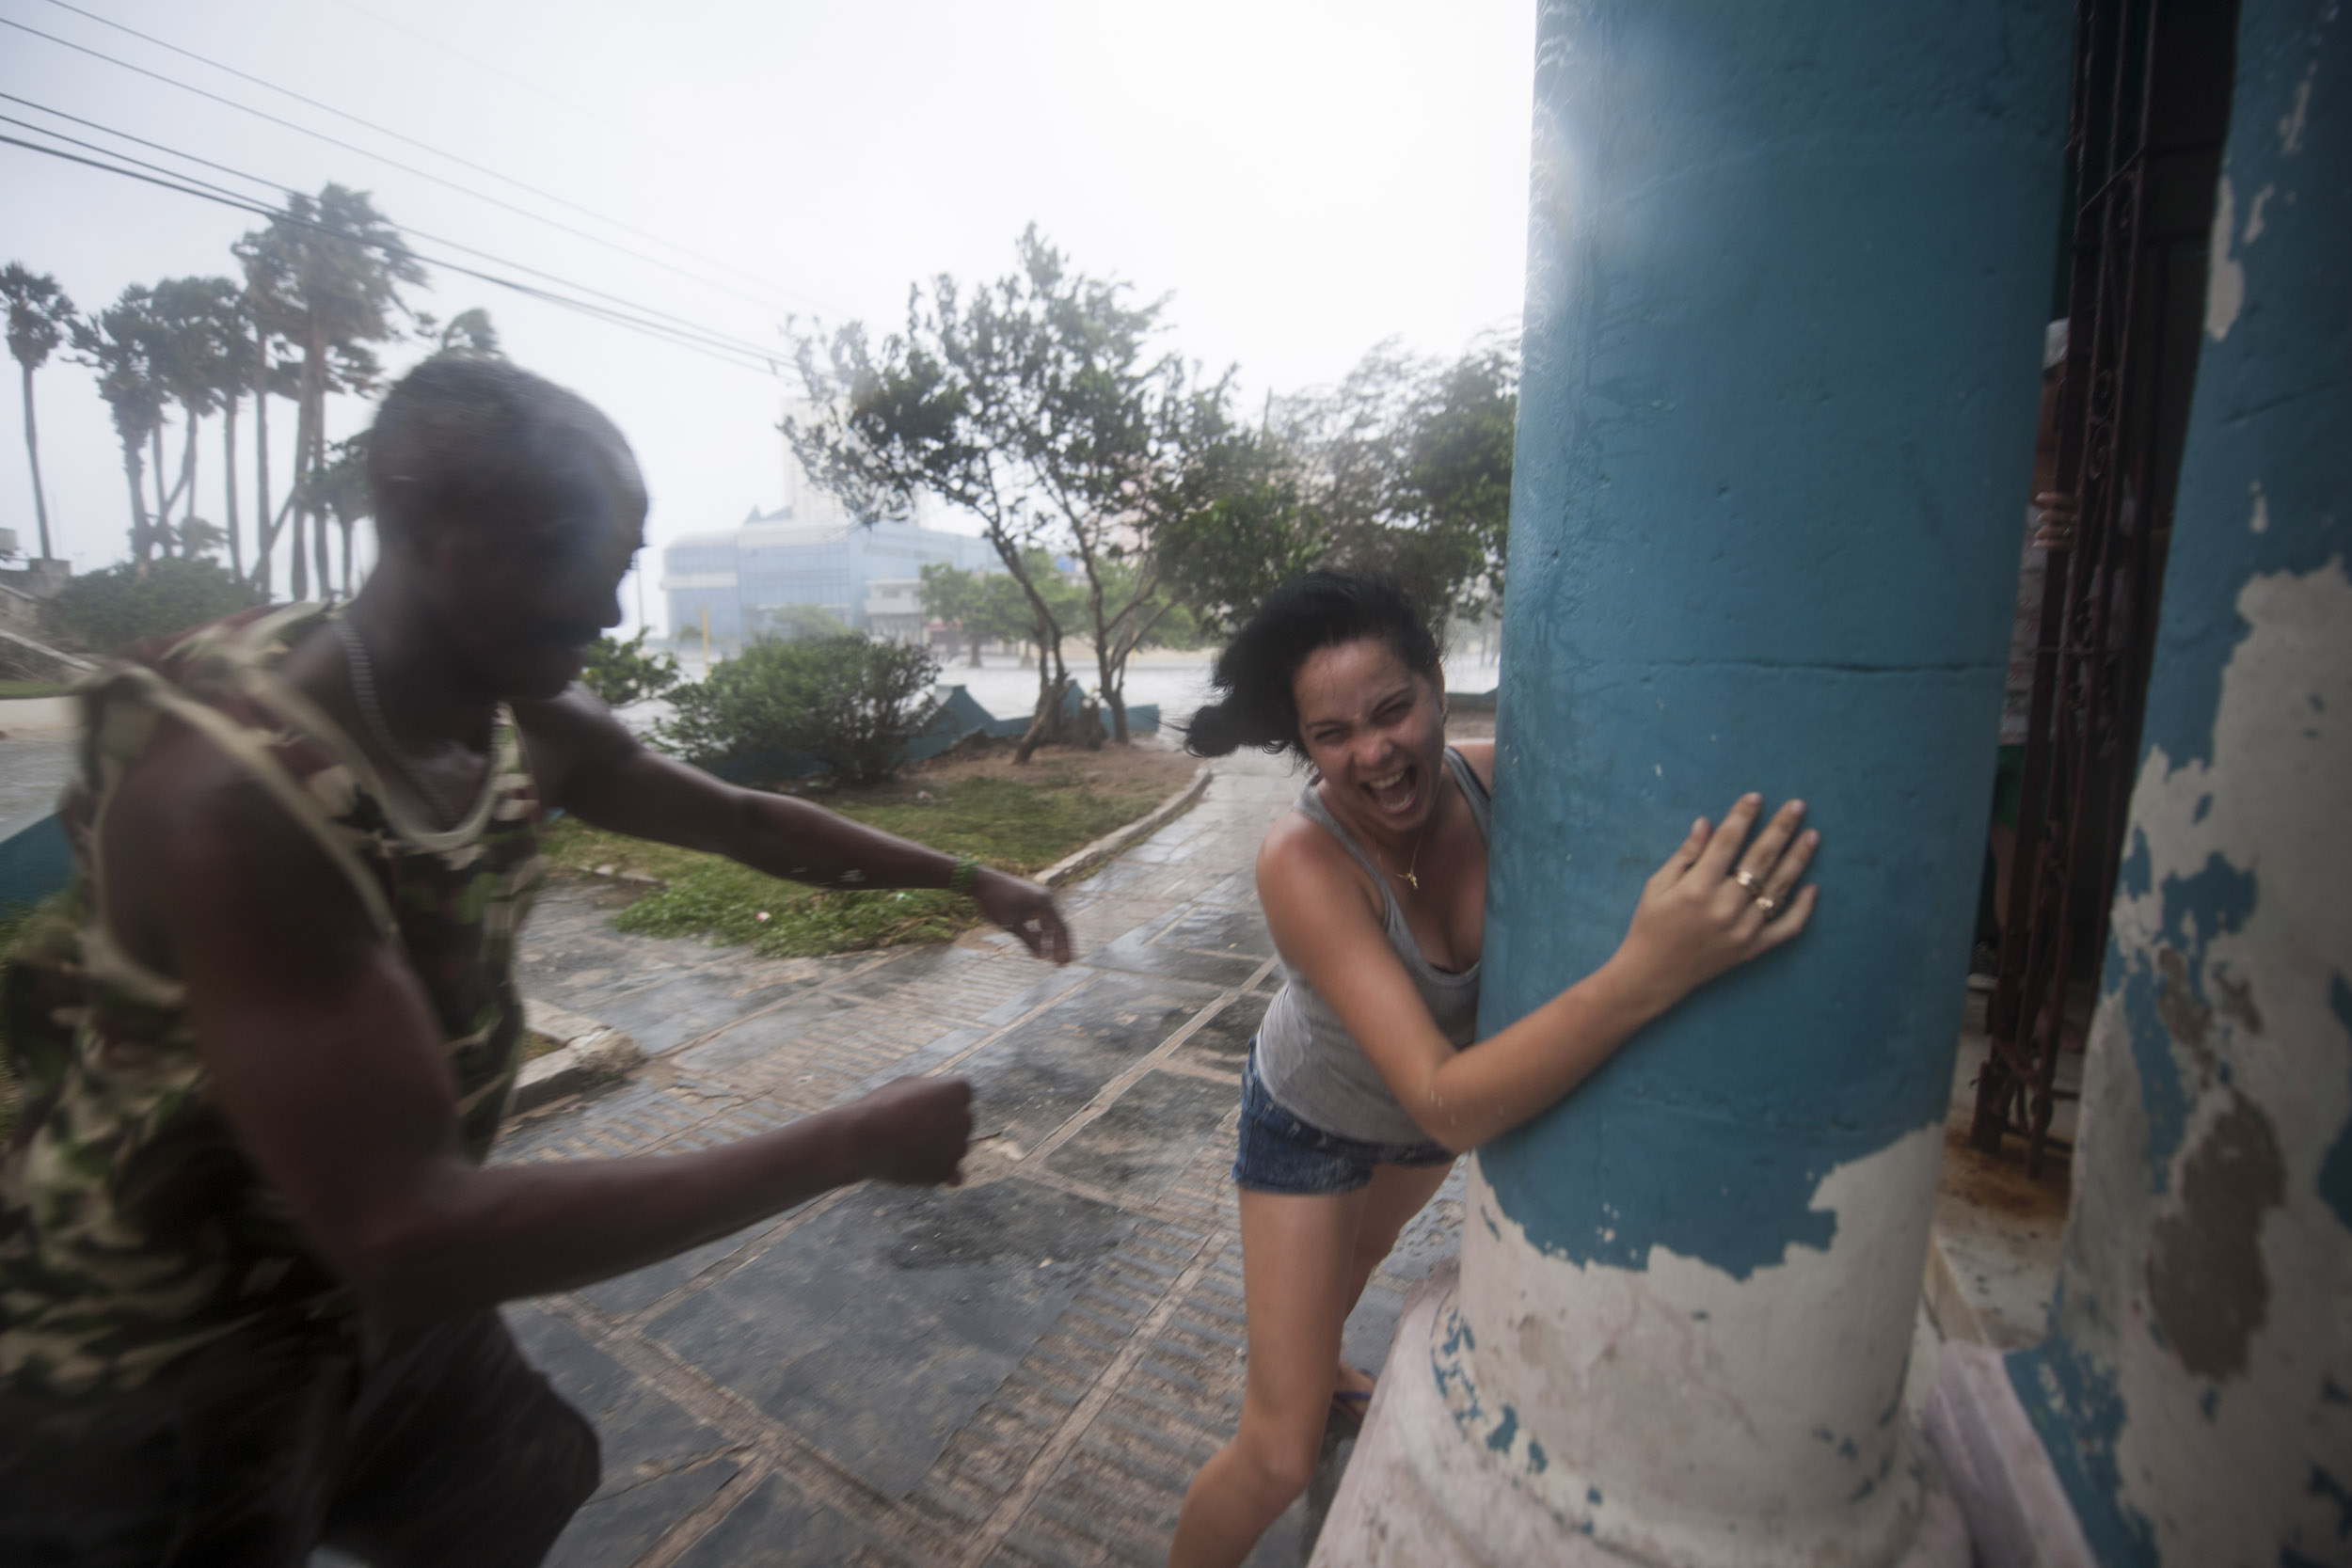 Huracán Irma - Cuba - Hector Garrido, Aerial and human photography